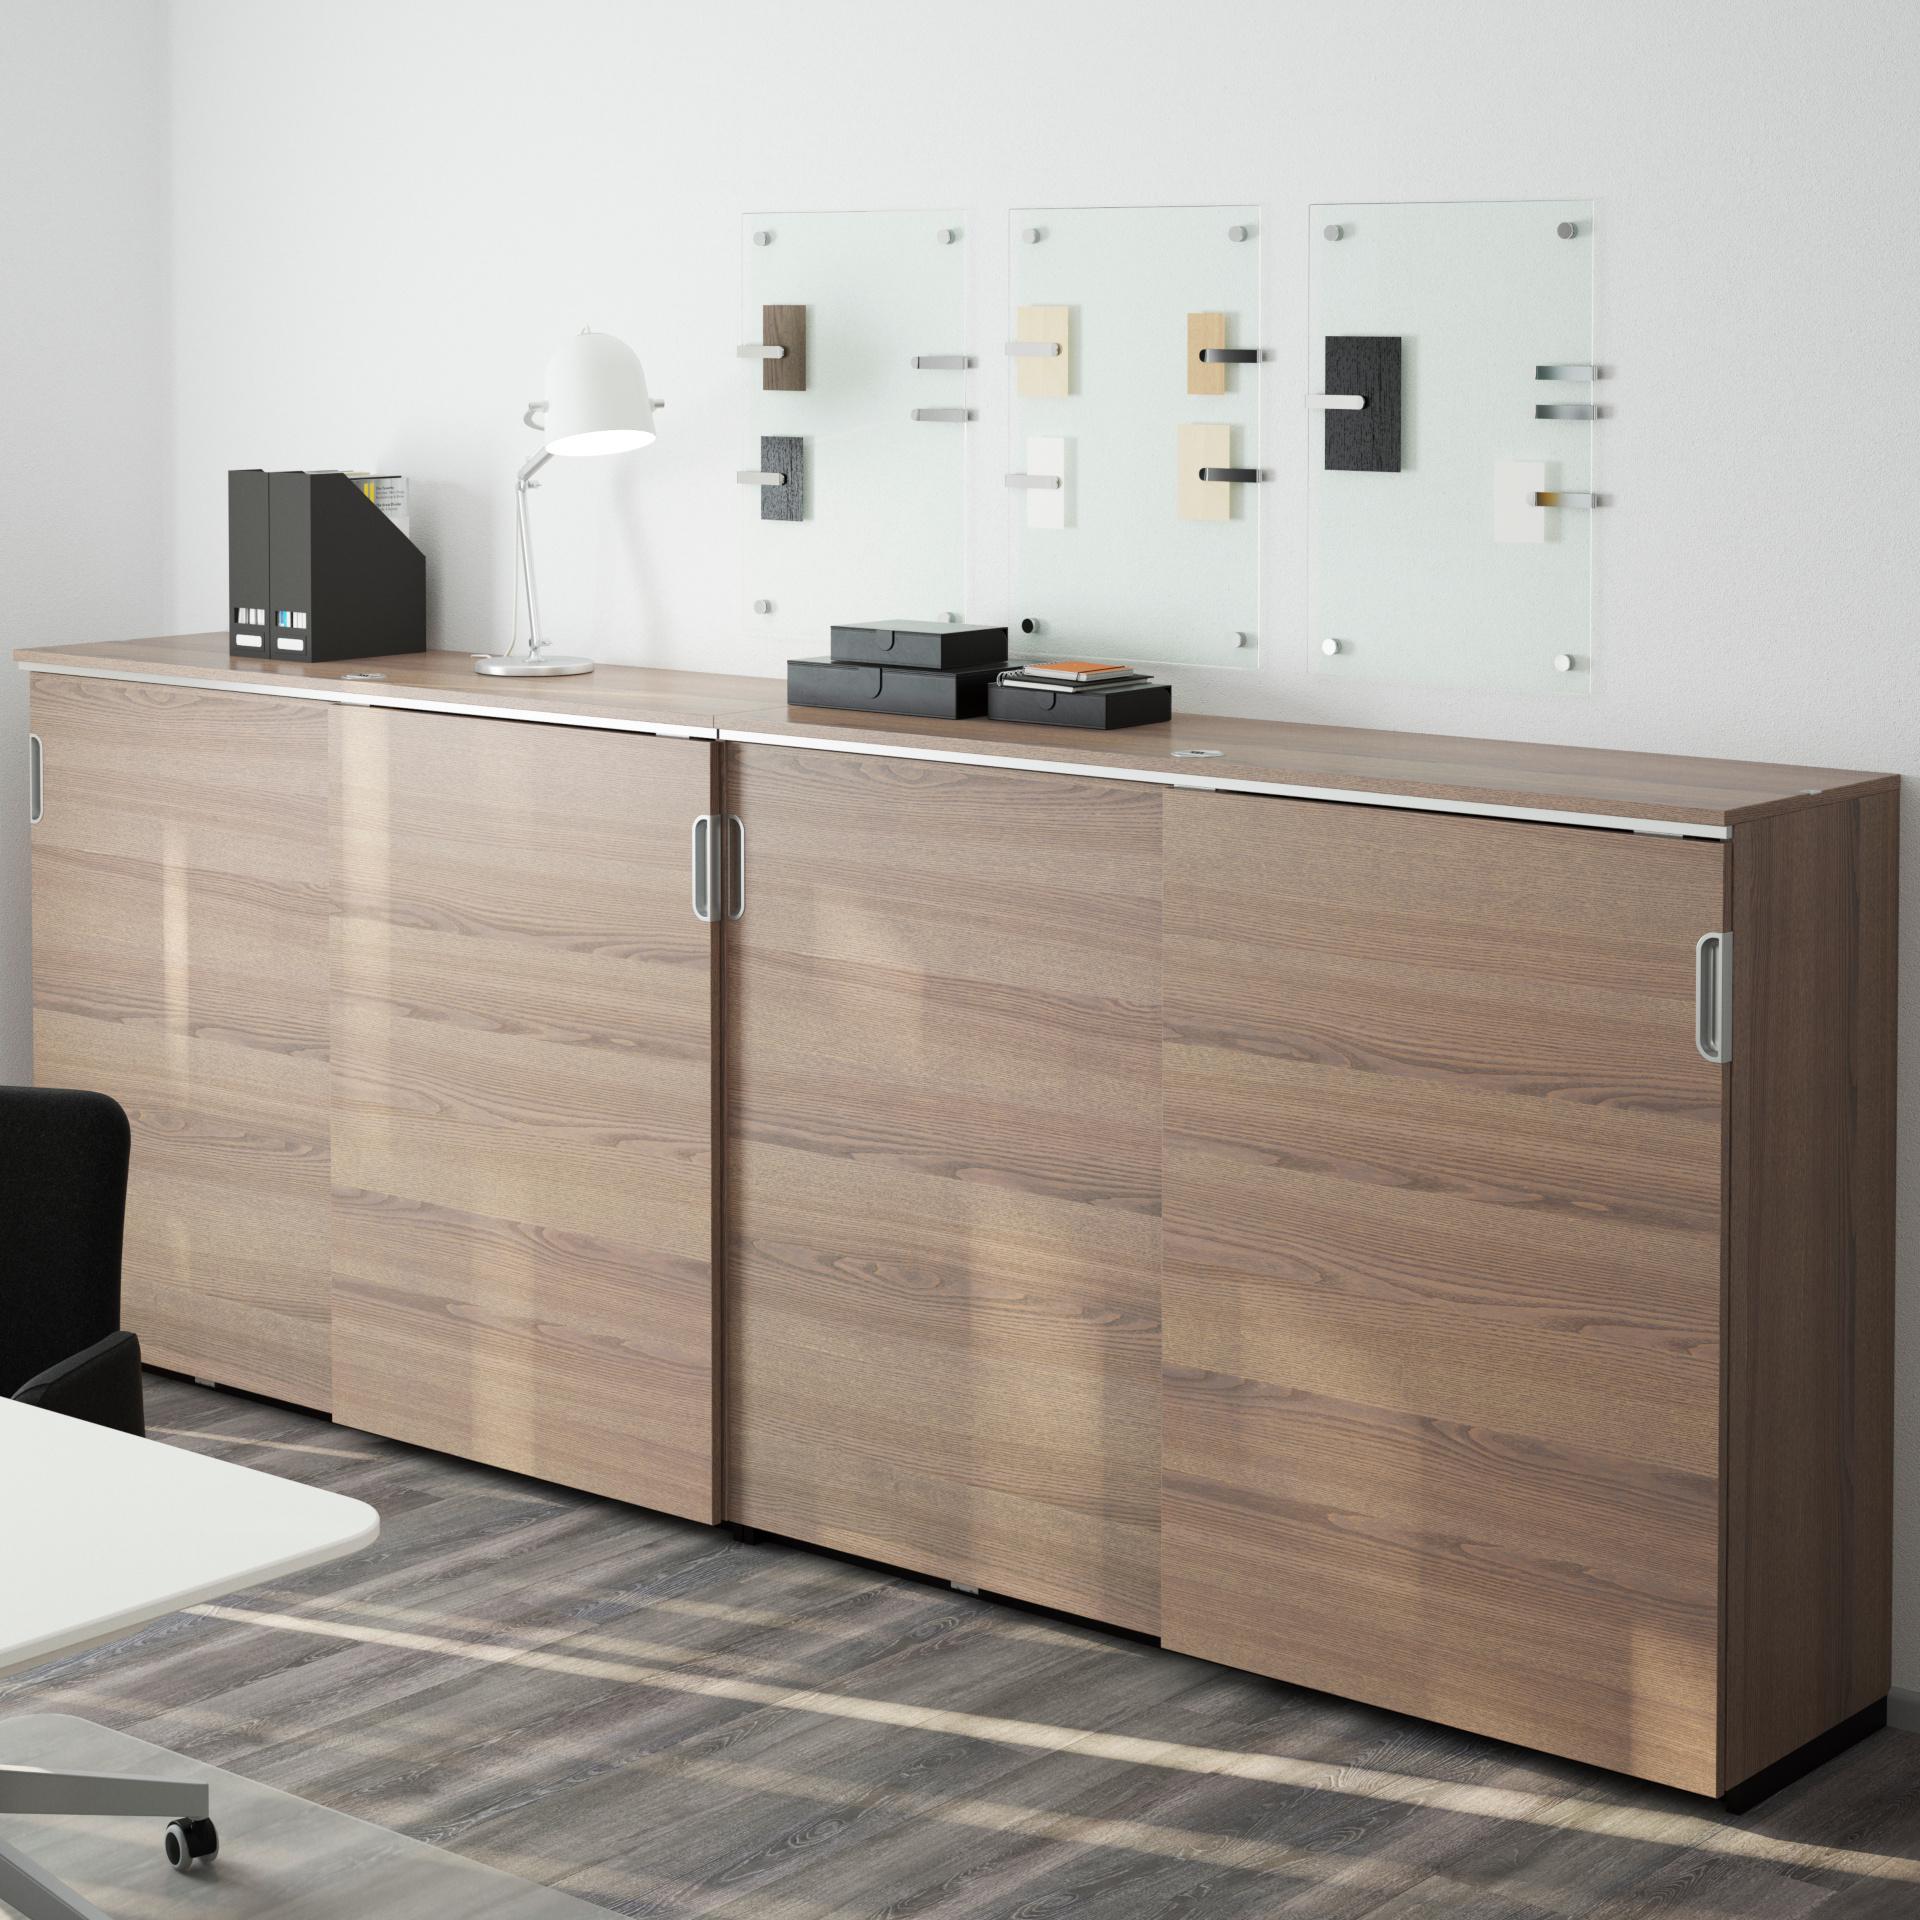 IKEA_007